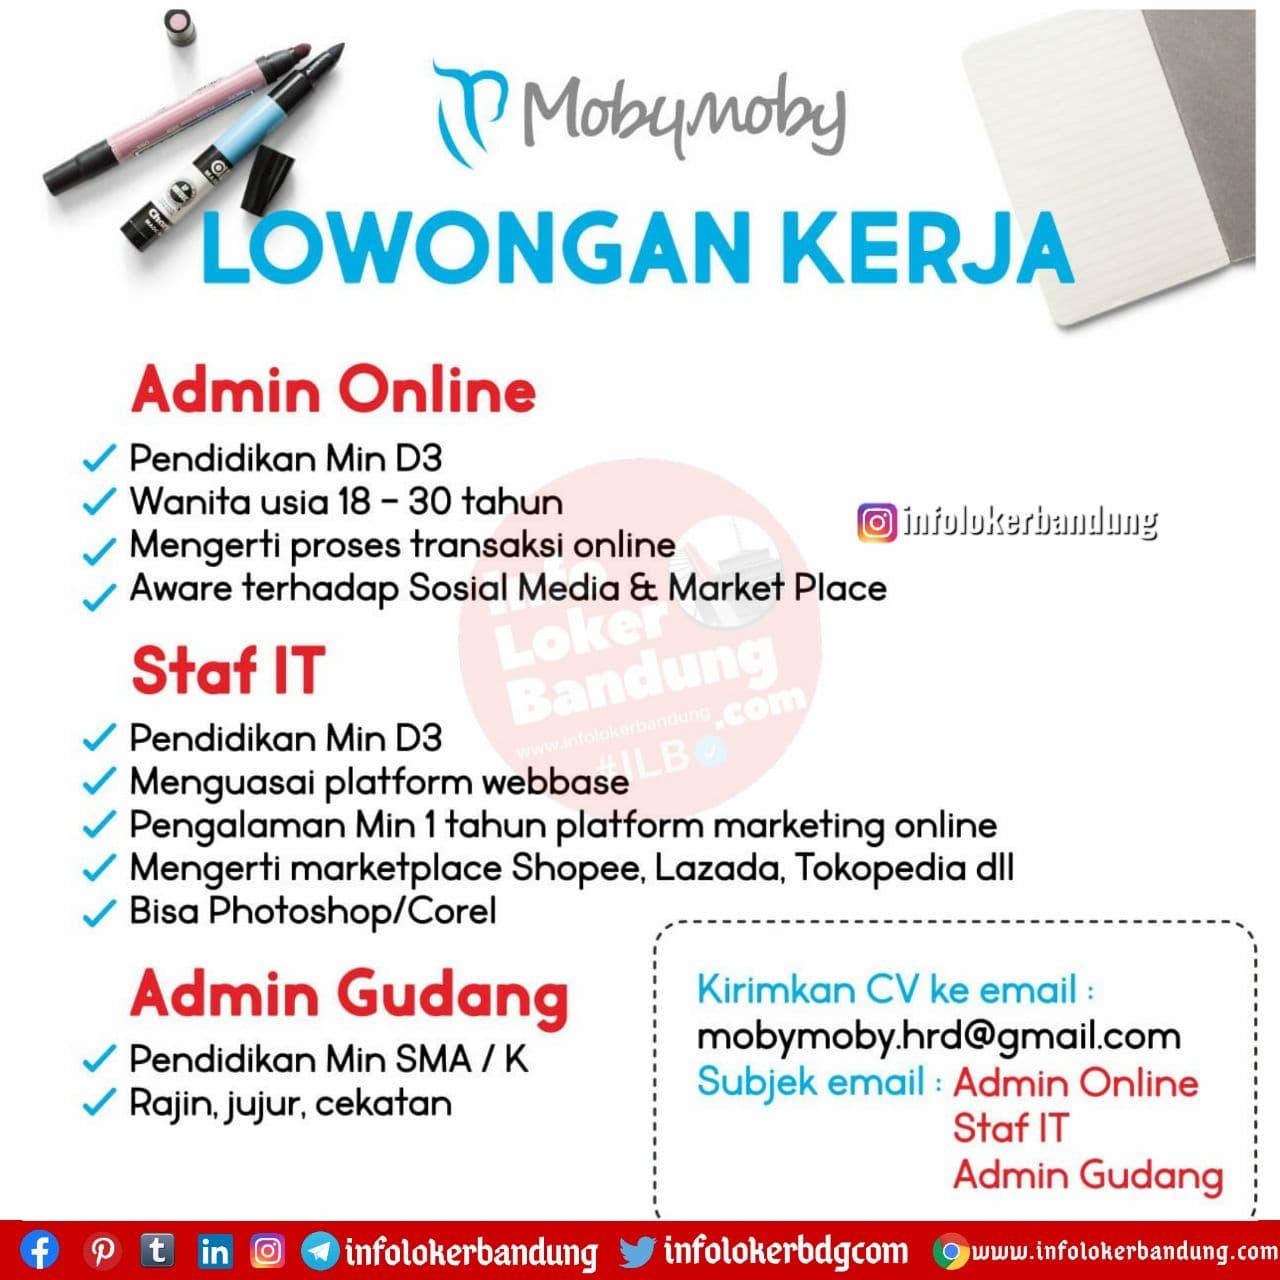 Lowongan Kerja Mobymoby Bandung Desember 2020